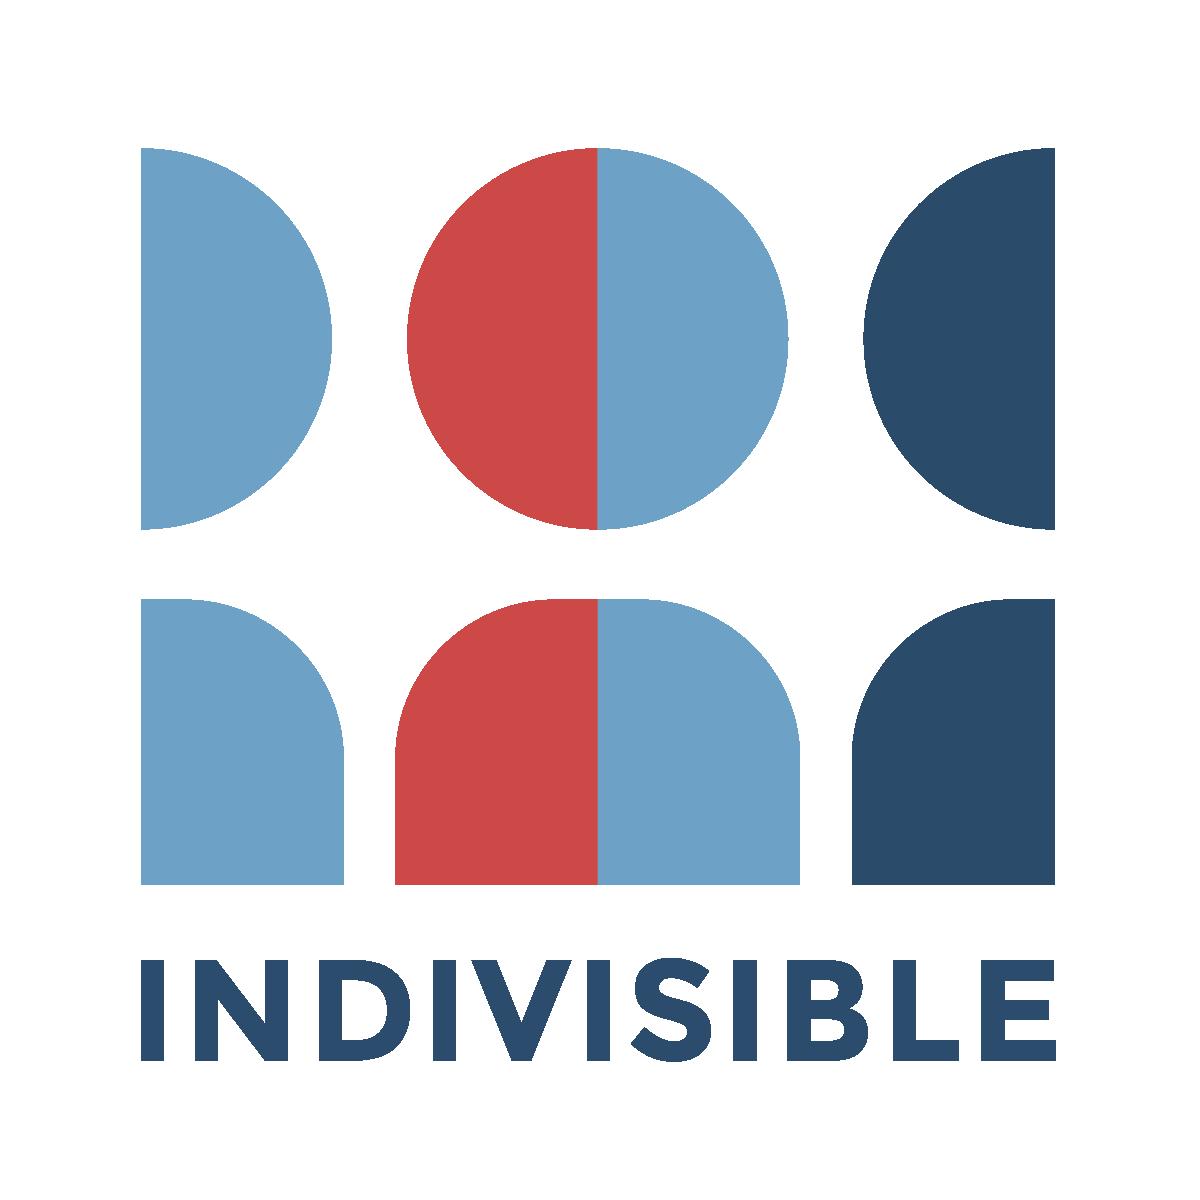 Indivisible_logo_square_transparent_w_wordmark-01.png